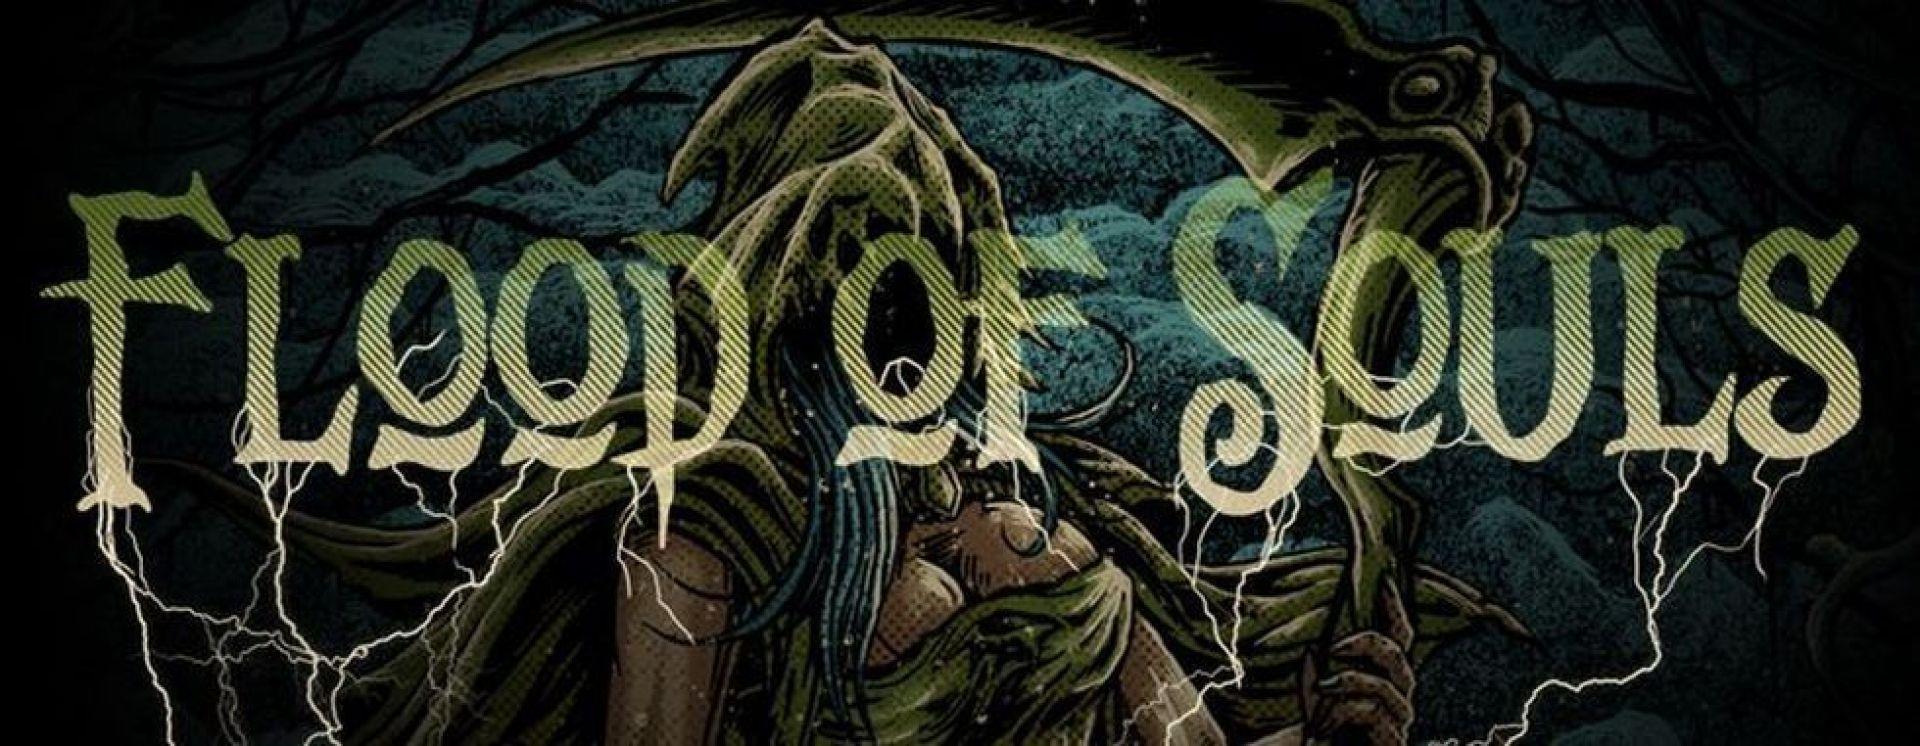 Flood of souls fb banner 980 copy